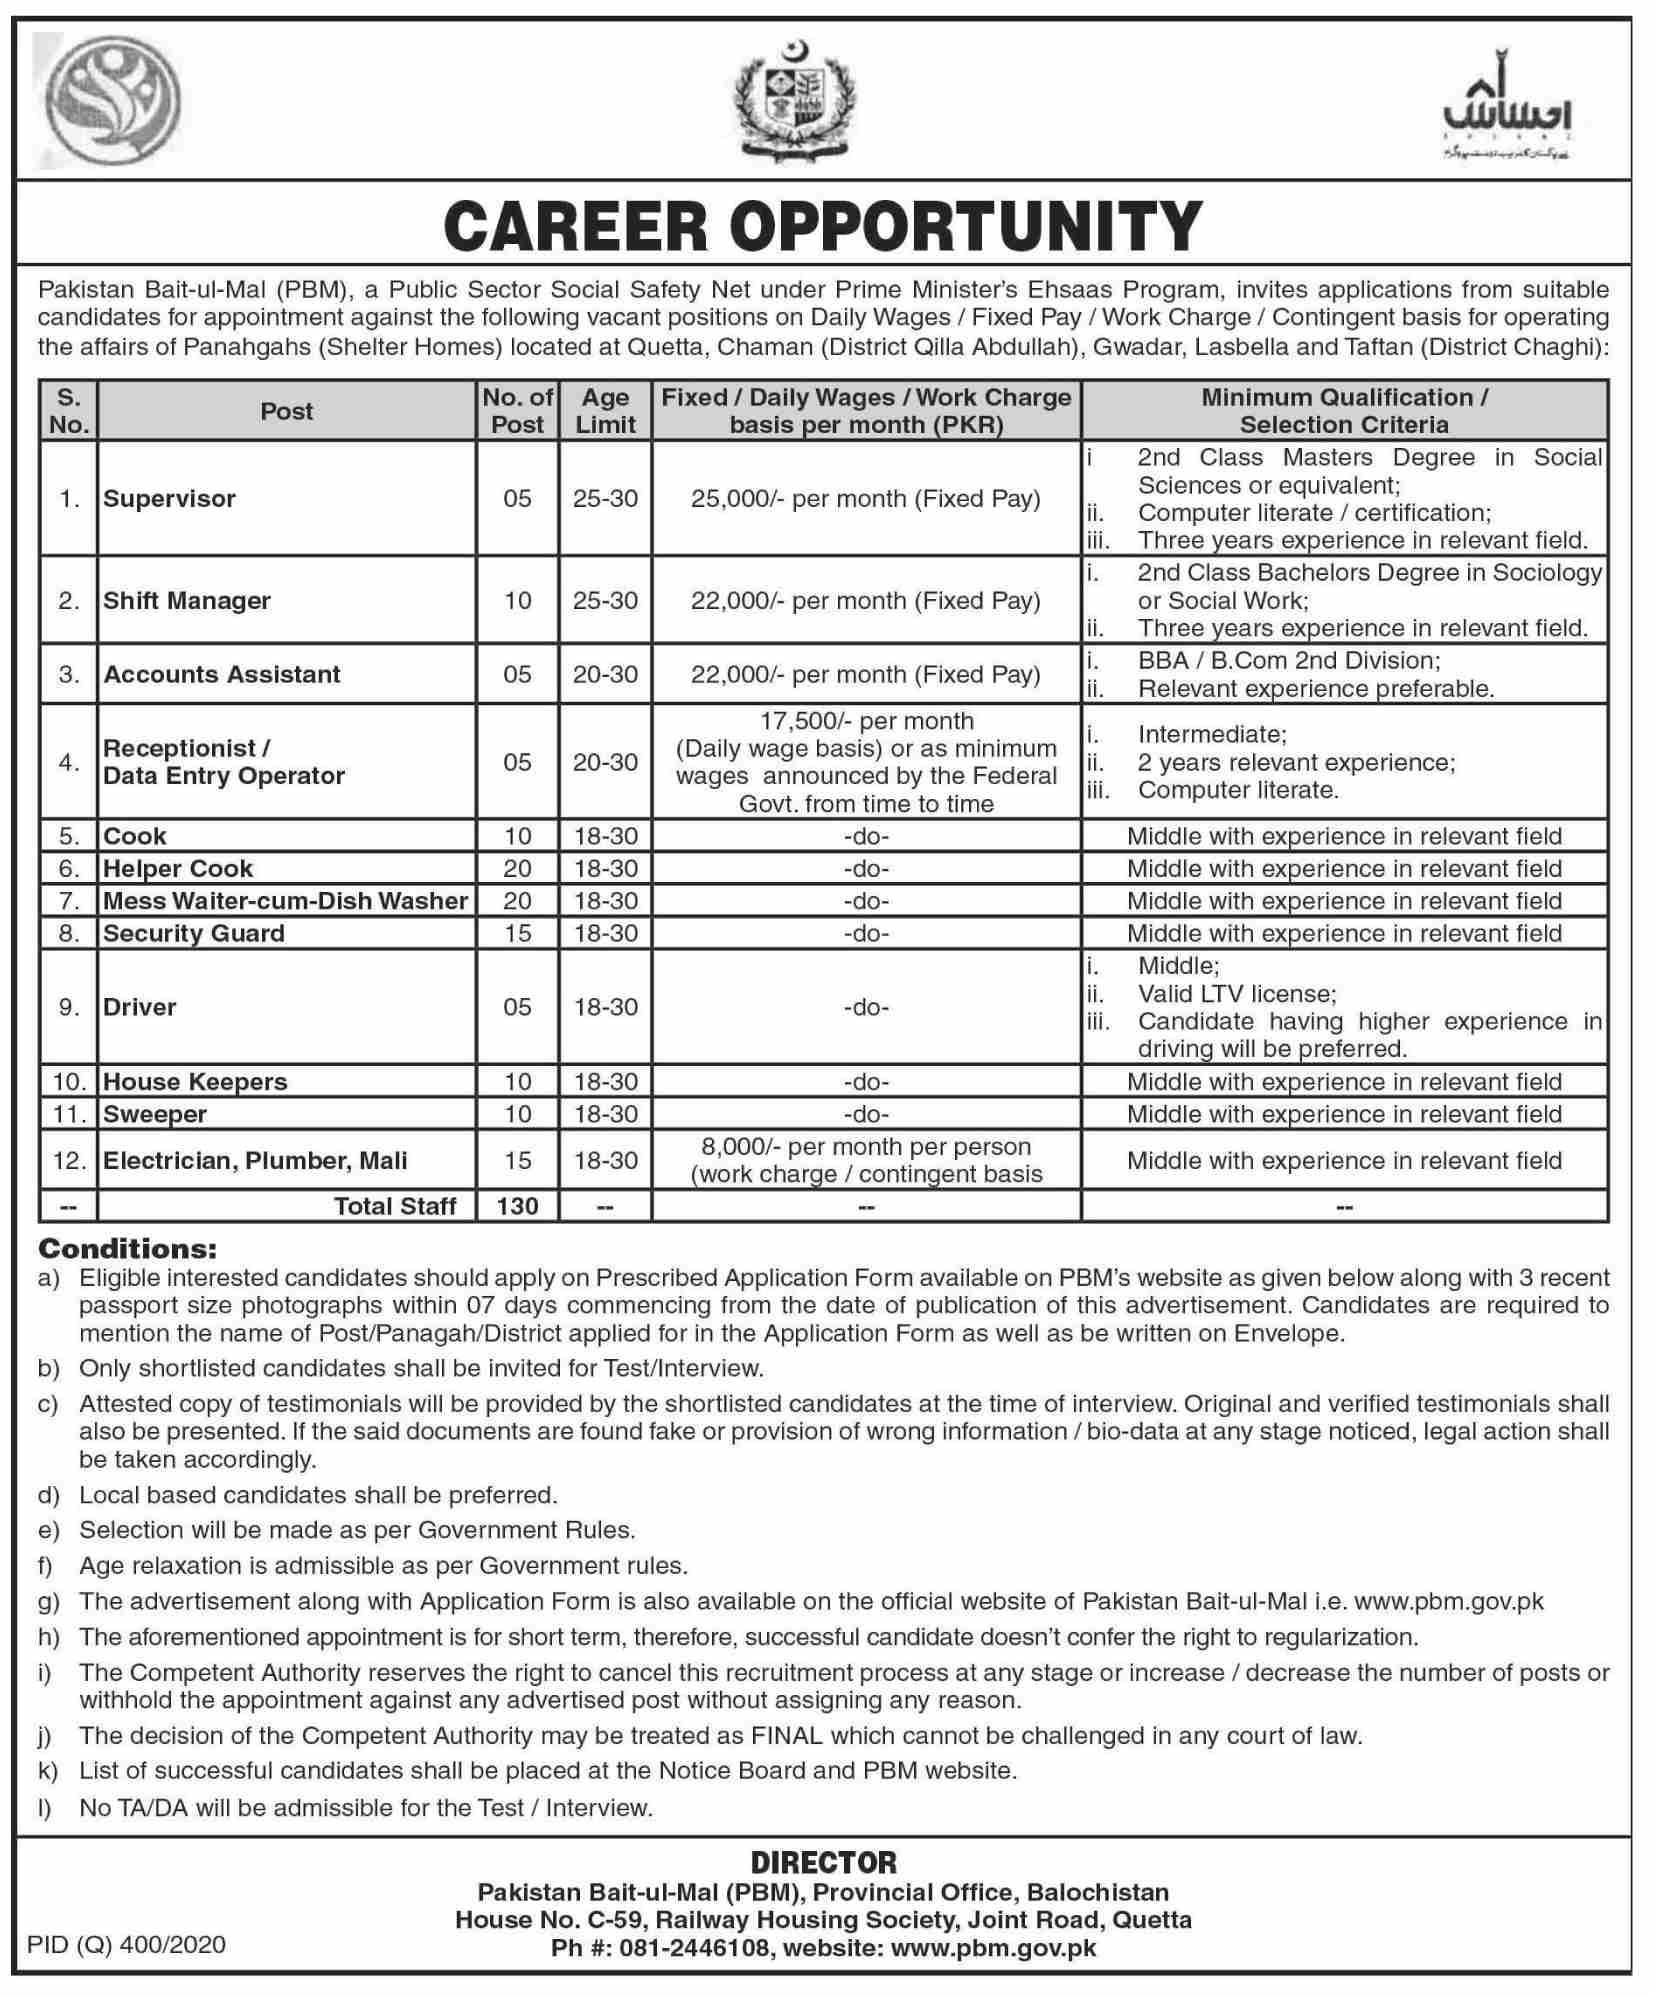 Pakistan Bait ul Mal November 2020 Jobs in Pakistan 2020 - Download Job Application Form - www.pbm.gov.pk